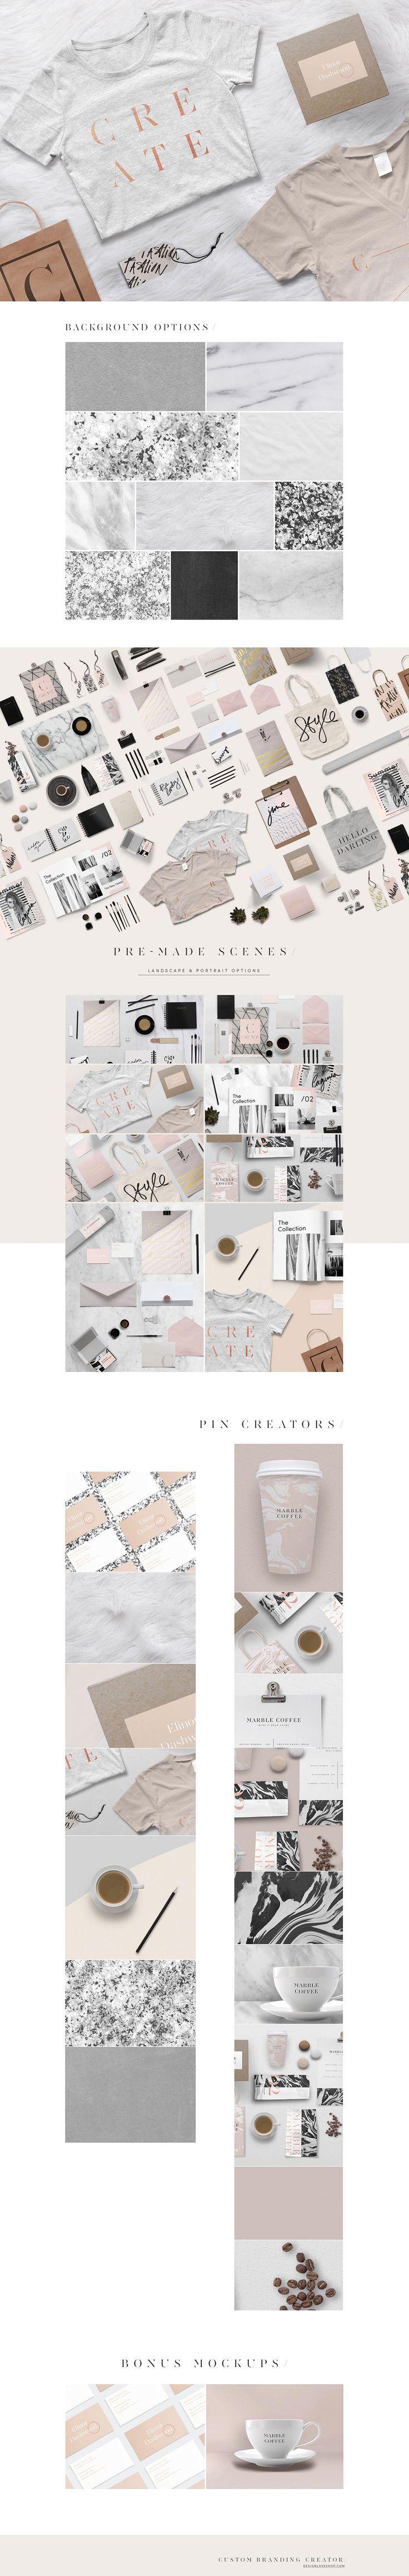 Custom Branding Creator 100+ Items By Designloveshop On @creativemarket